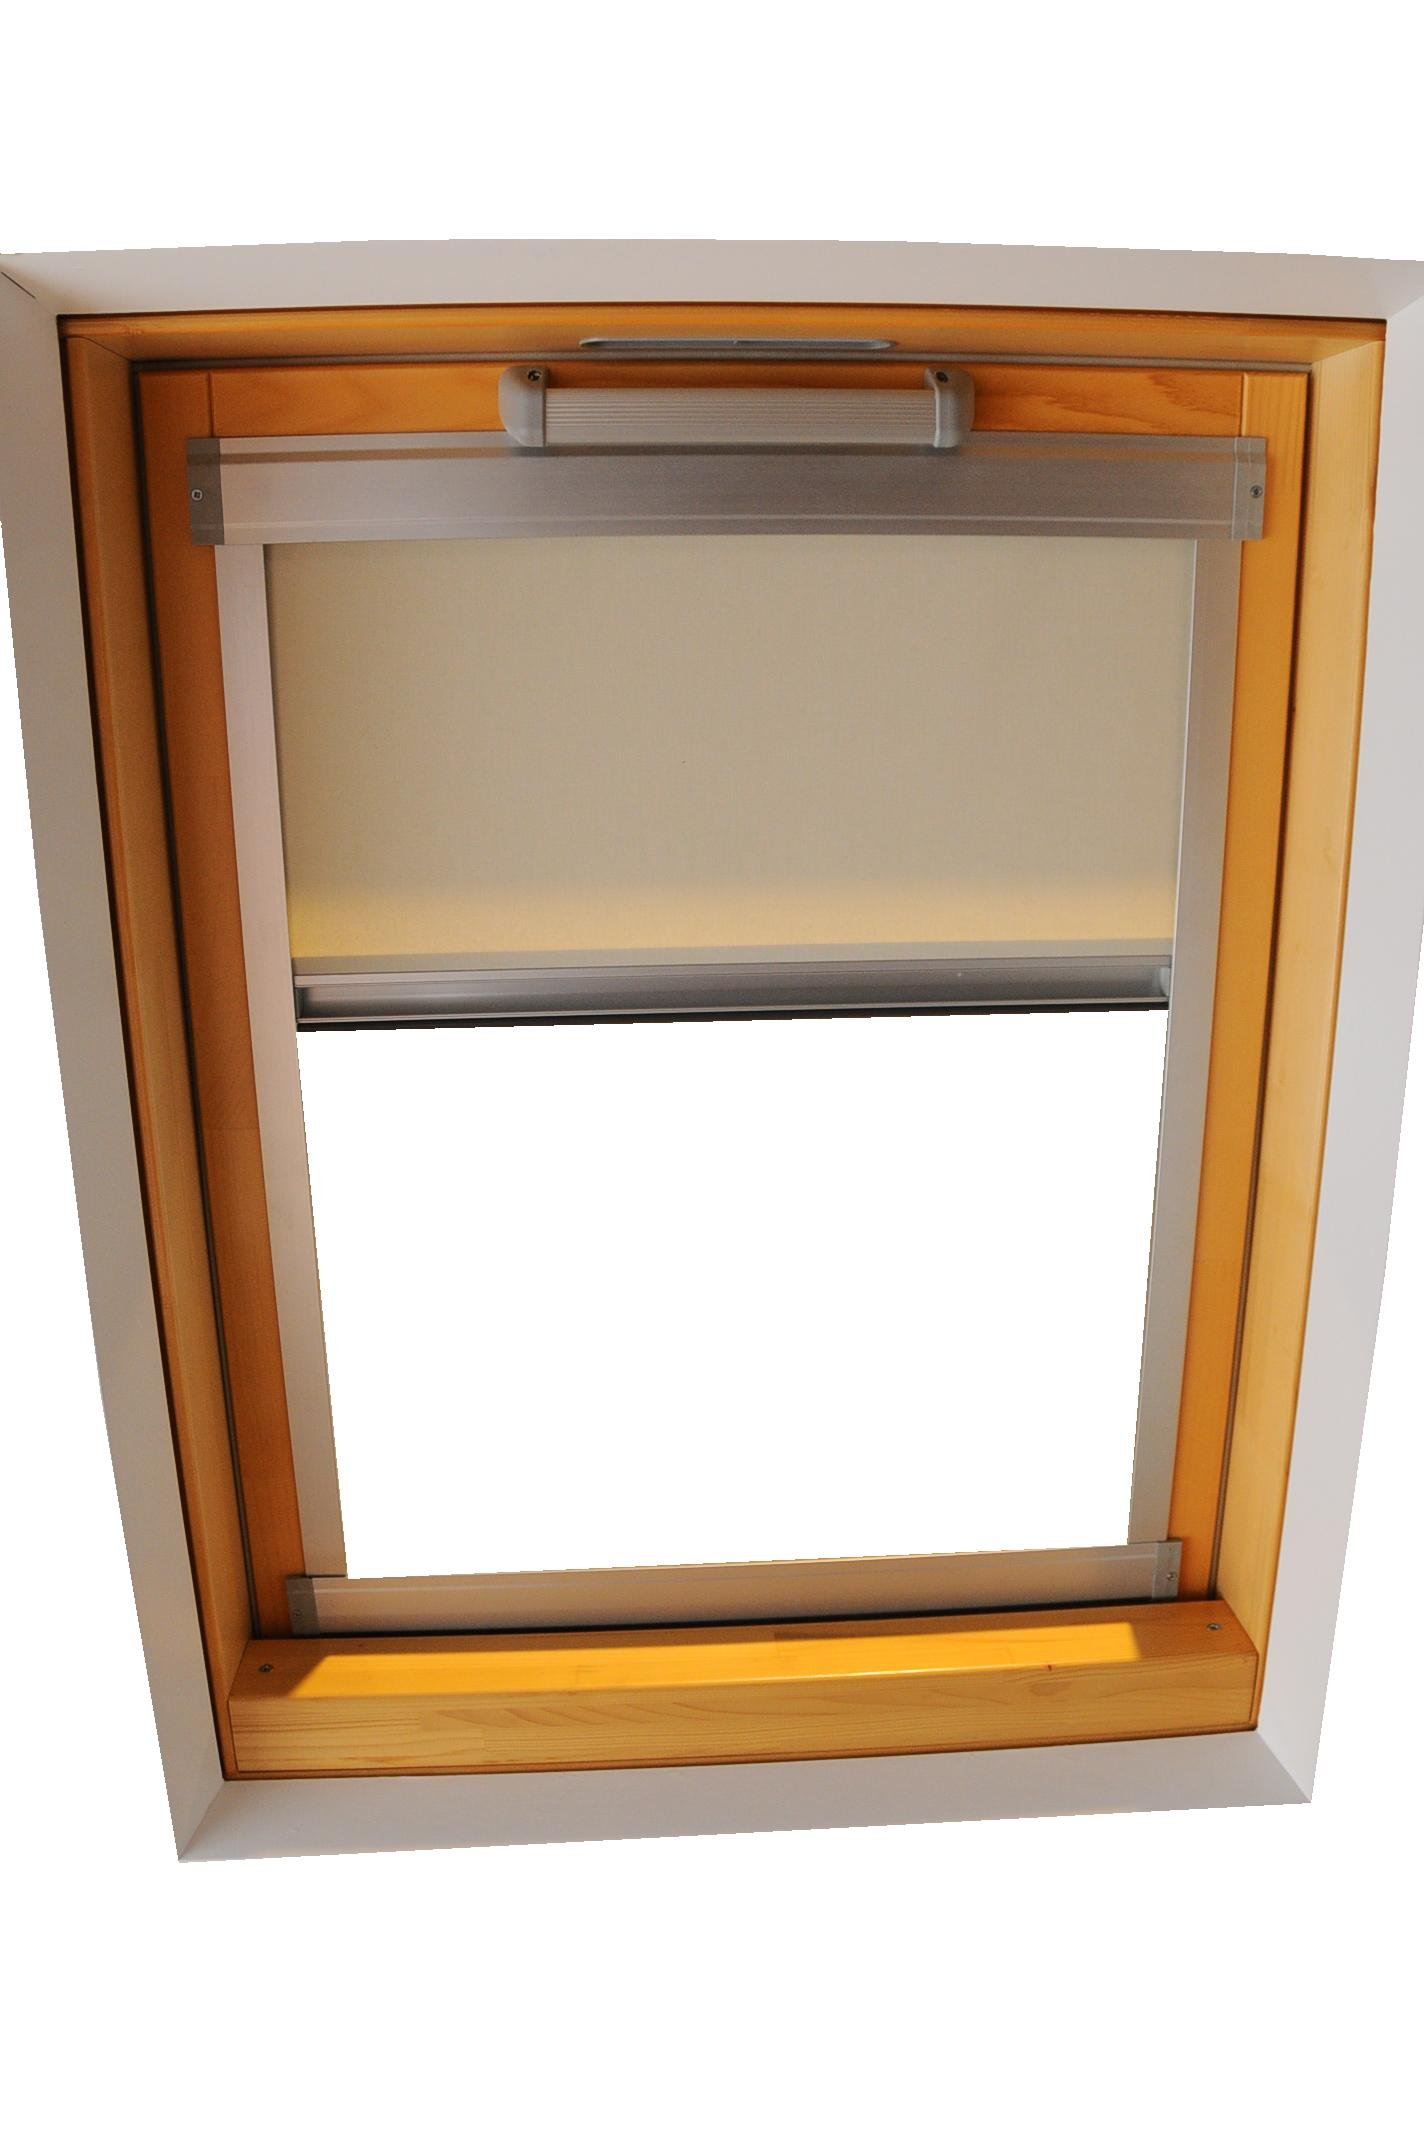 appui de fenetre dtu caen chambery nancy estimation prix m2 notaire soci t ljbkw. Black Bedroom Furniture Sets. Home Design Ideas